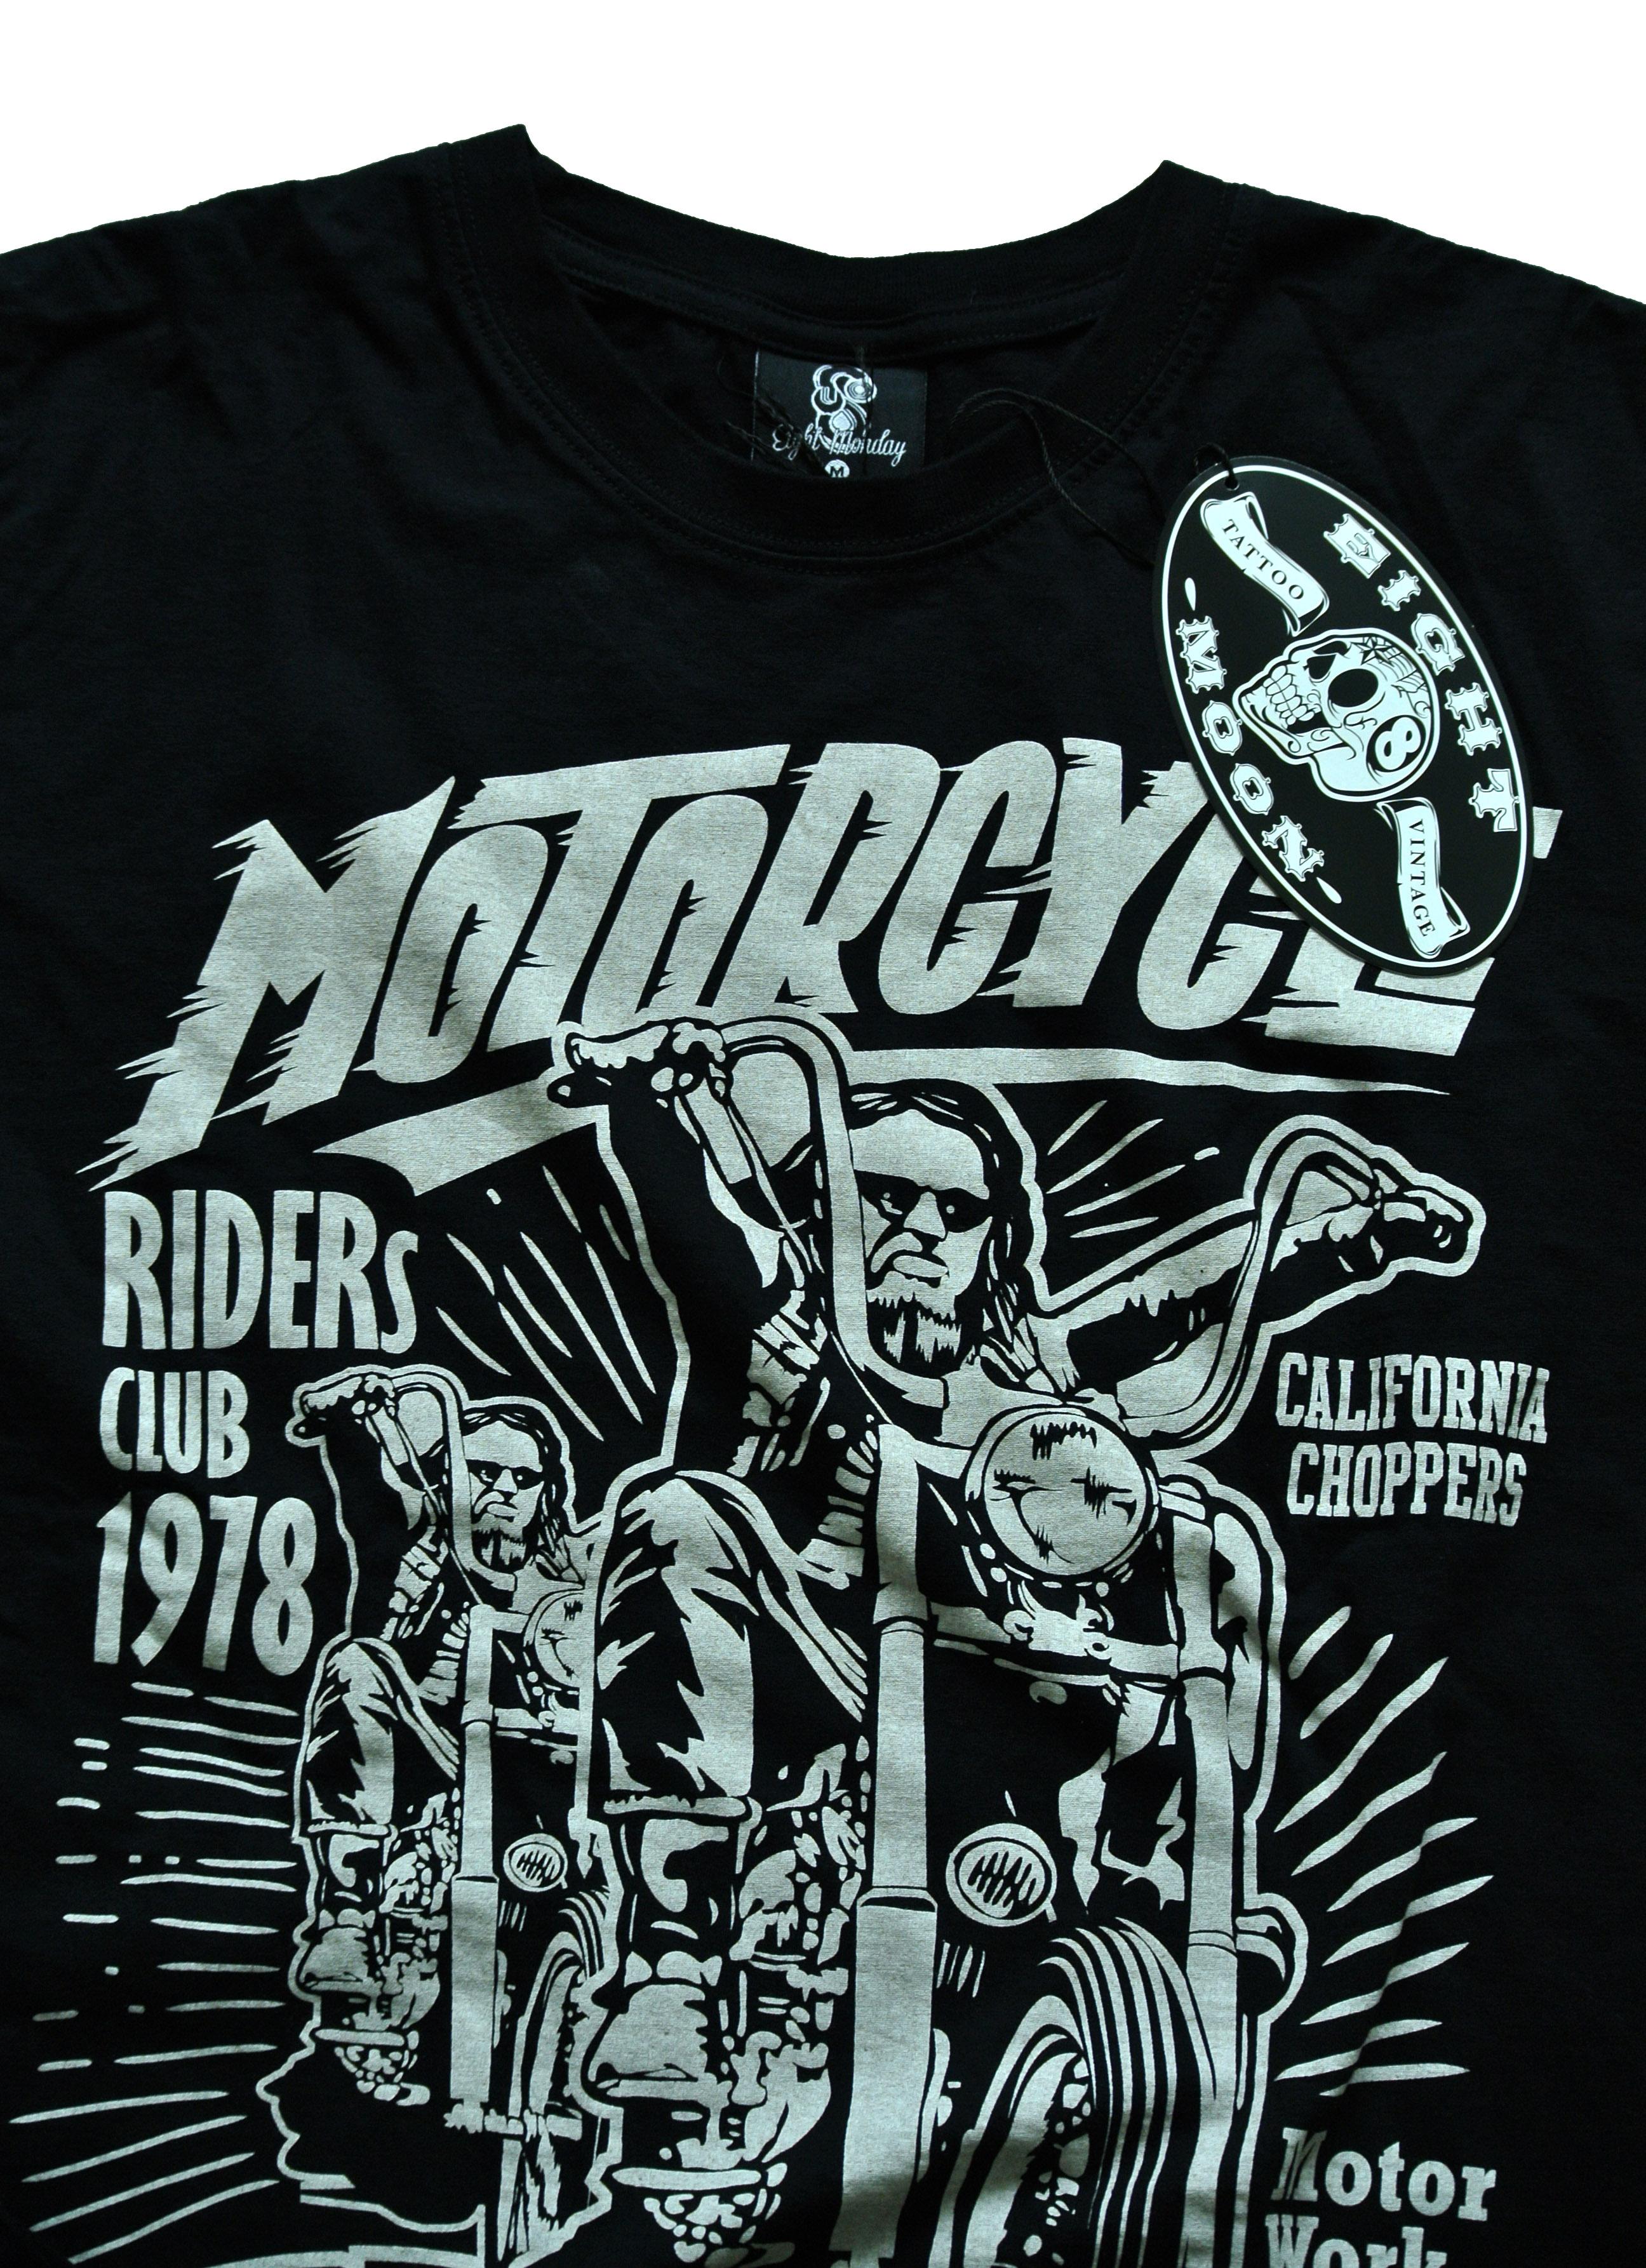 eight_monday_mens_shirt_vintage_west_coast_chopper_motorcycle_biker_em23_t_shirts_5.jpg